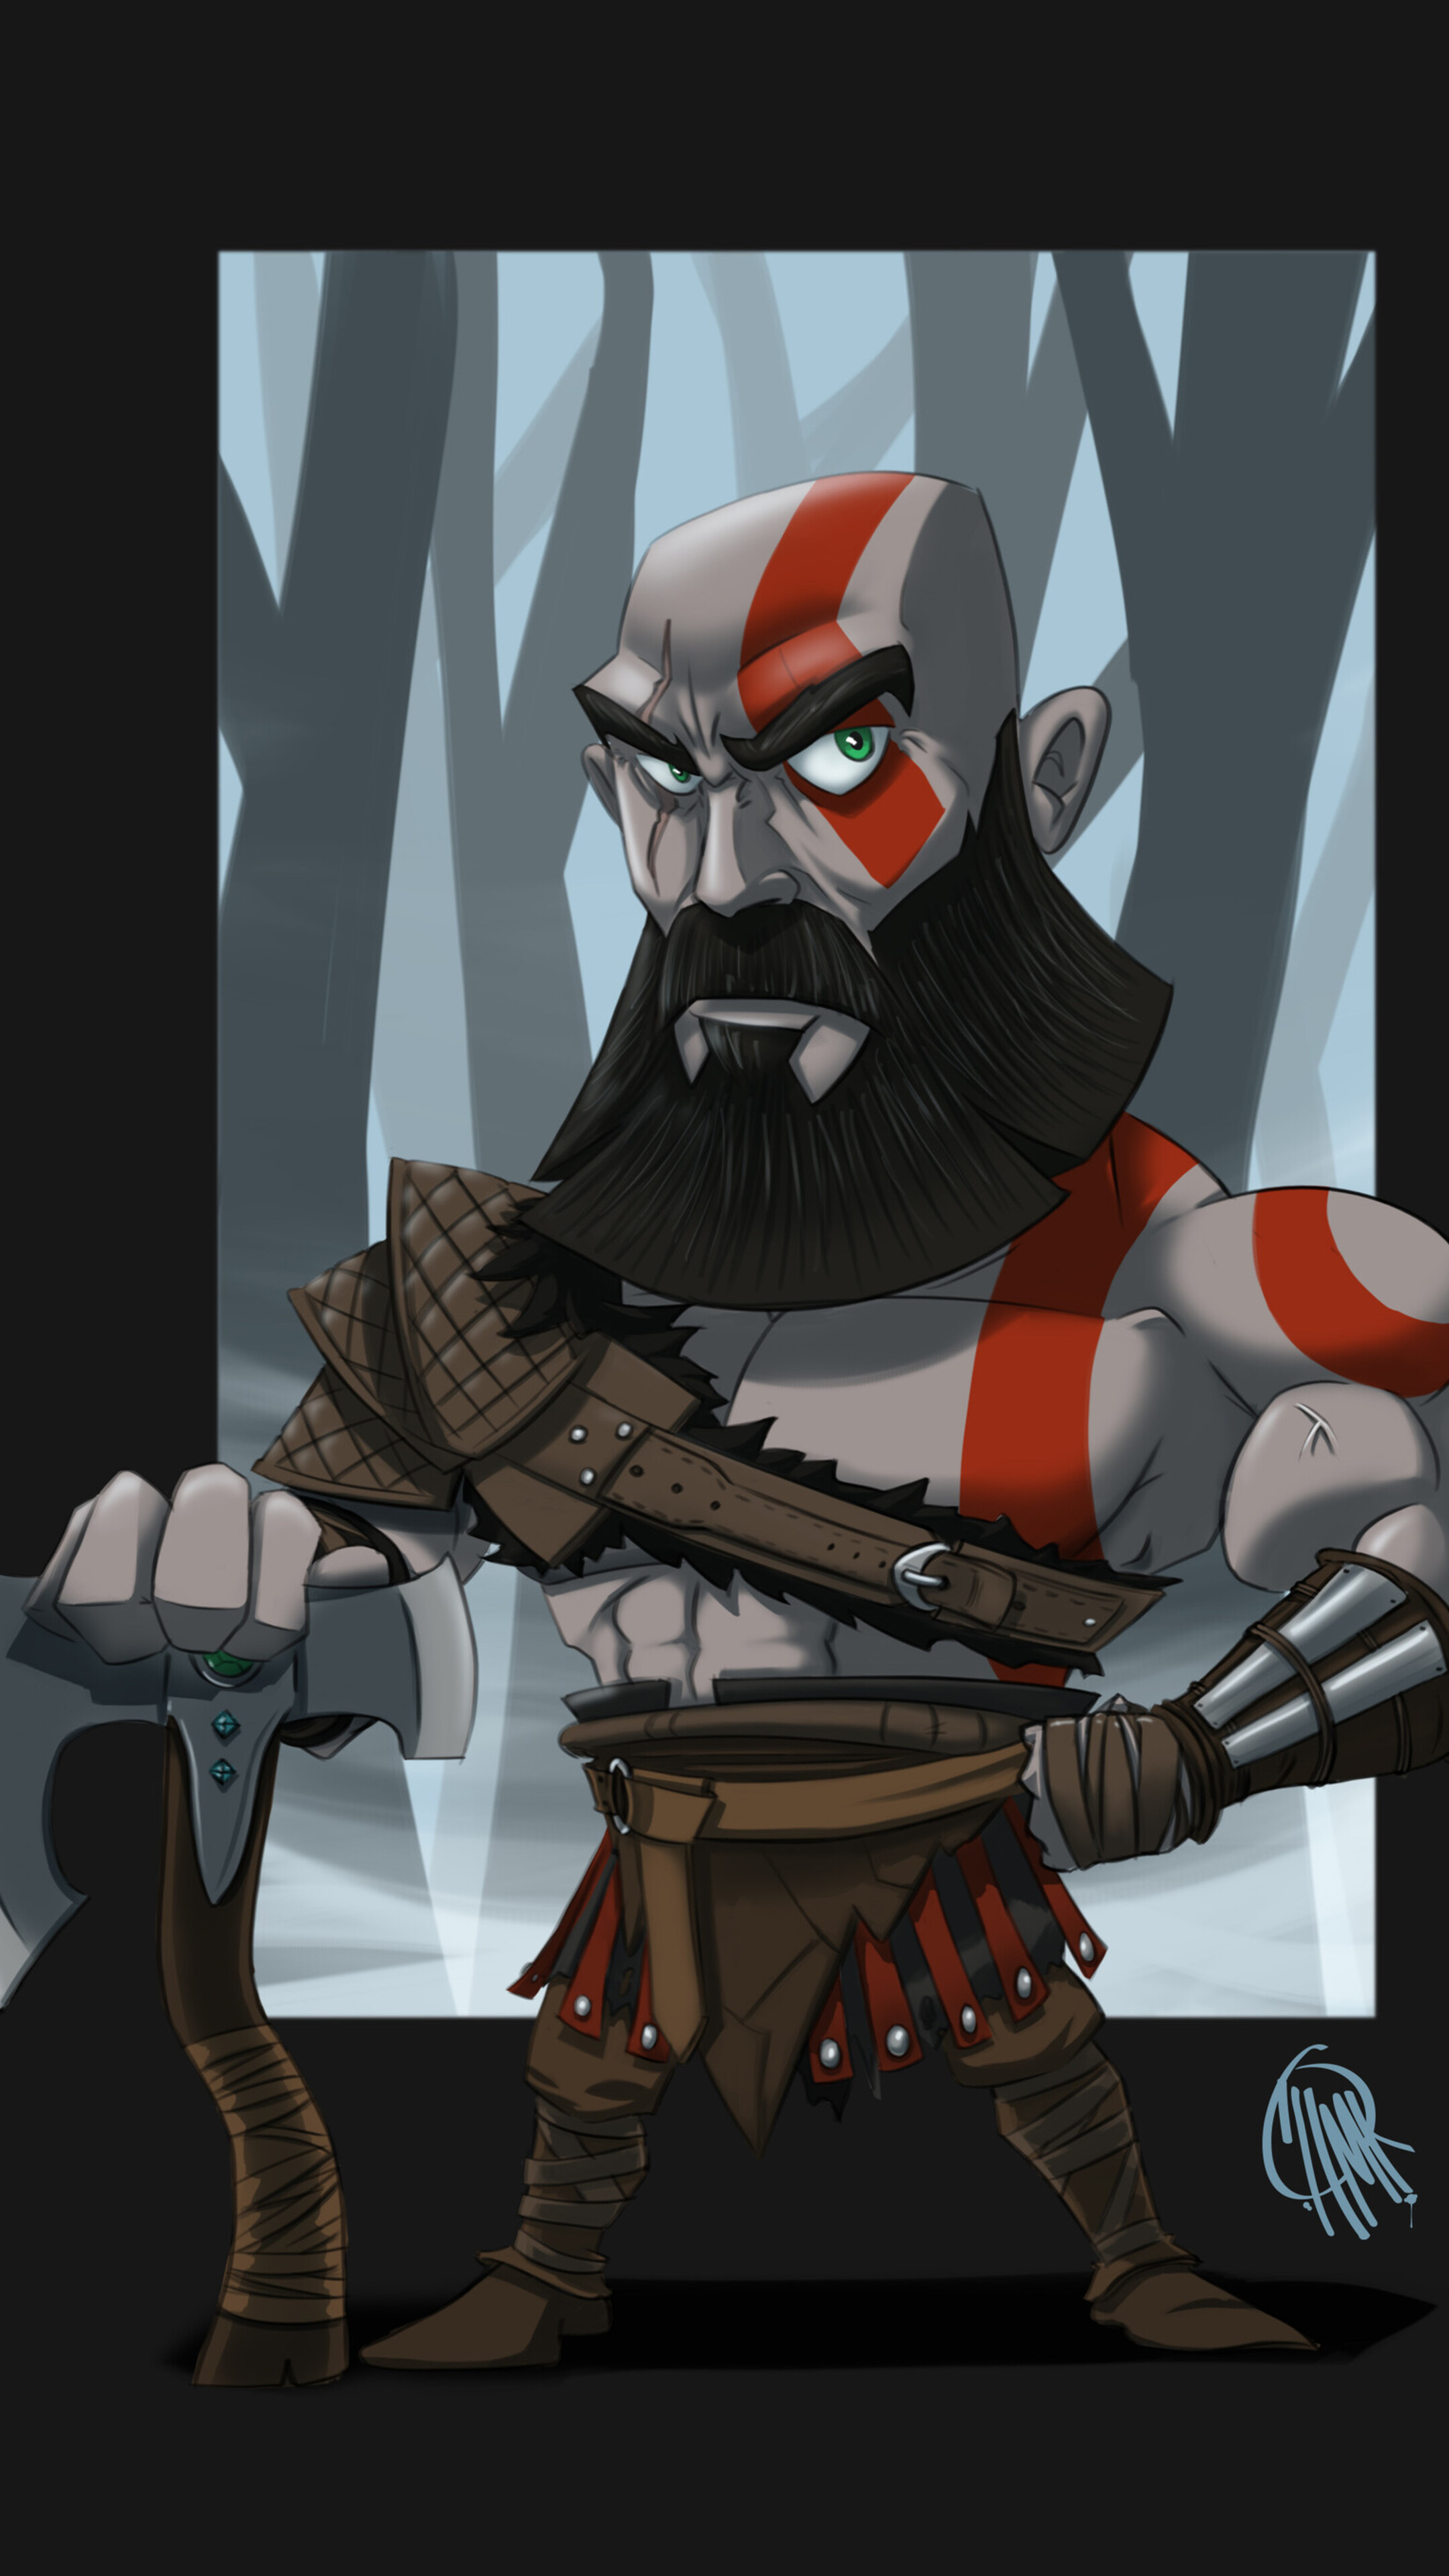 kratos-2020-minimalism-5o.jpg